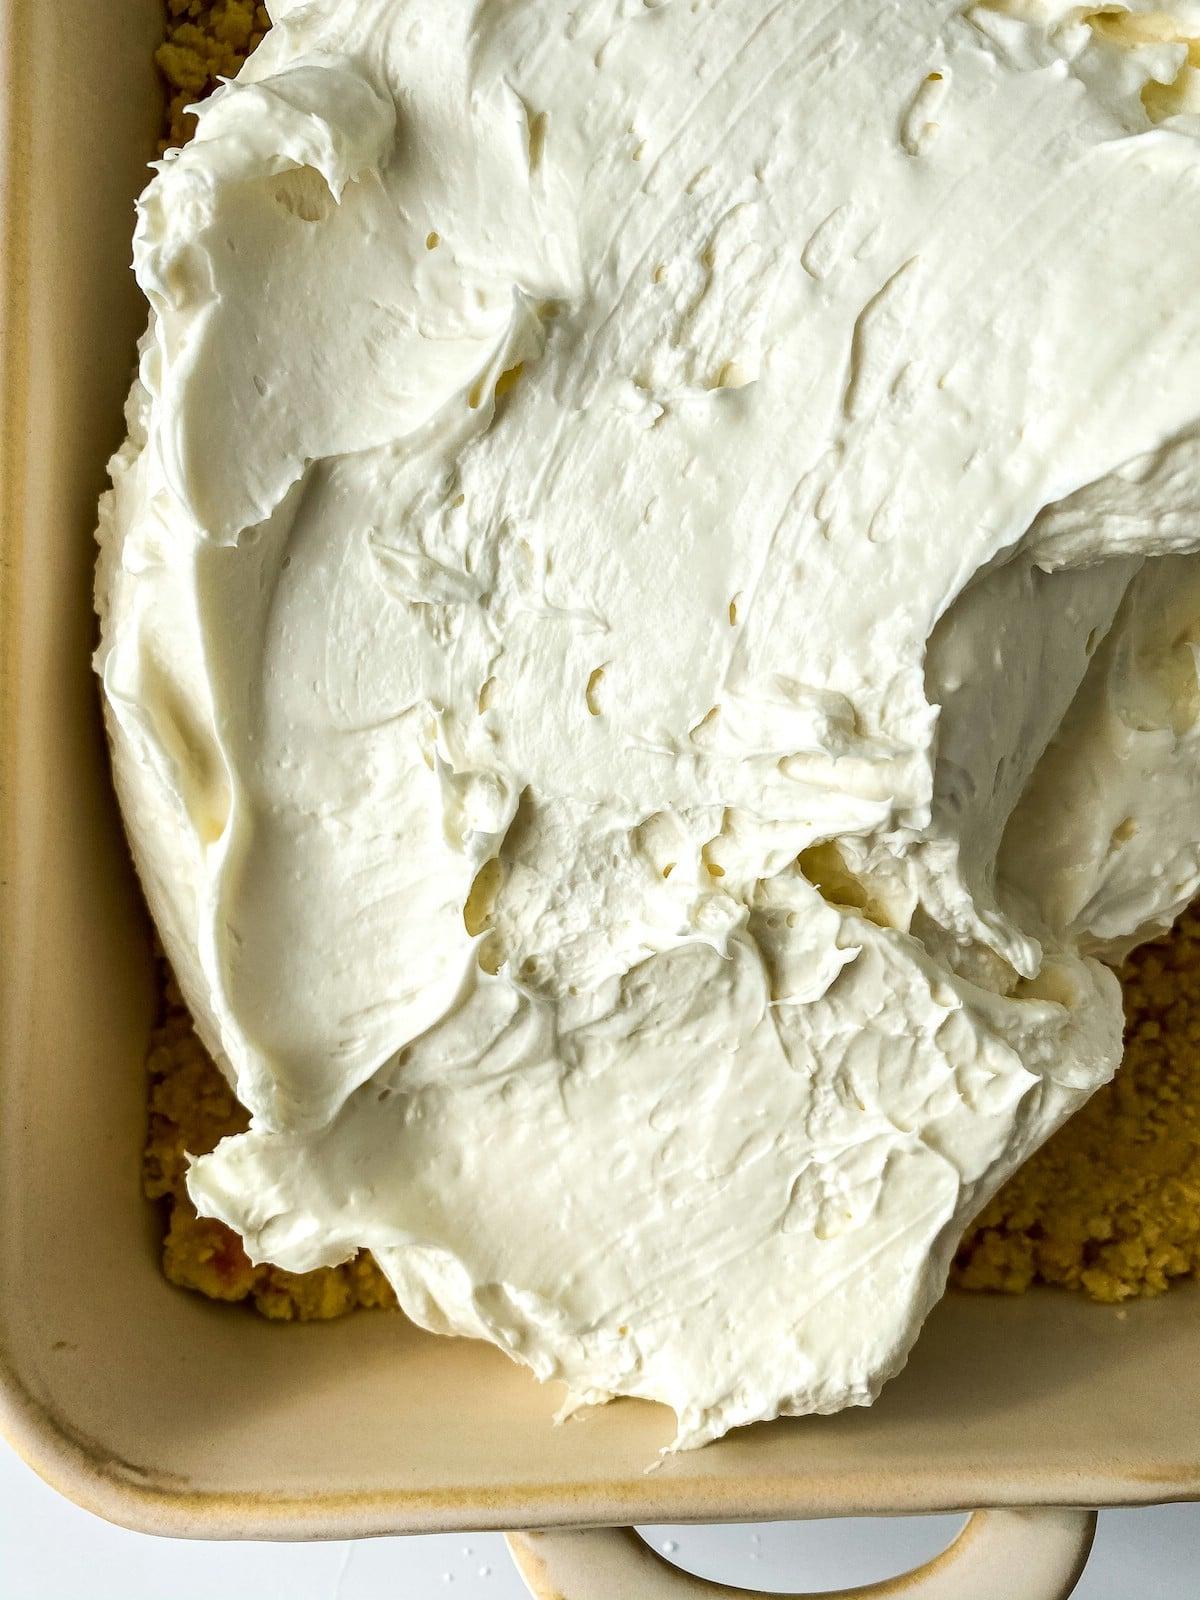 Spreading cream cheese into baking dish